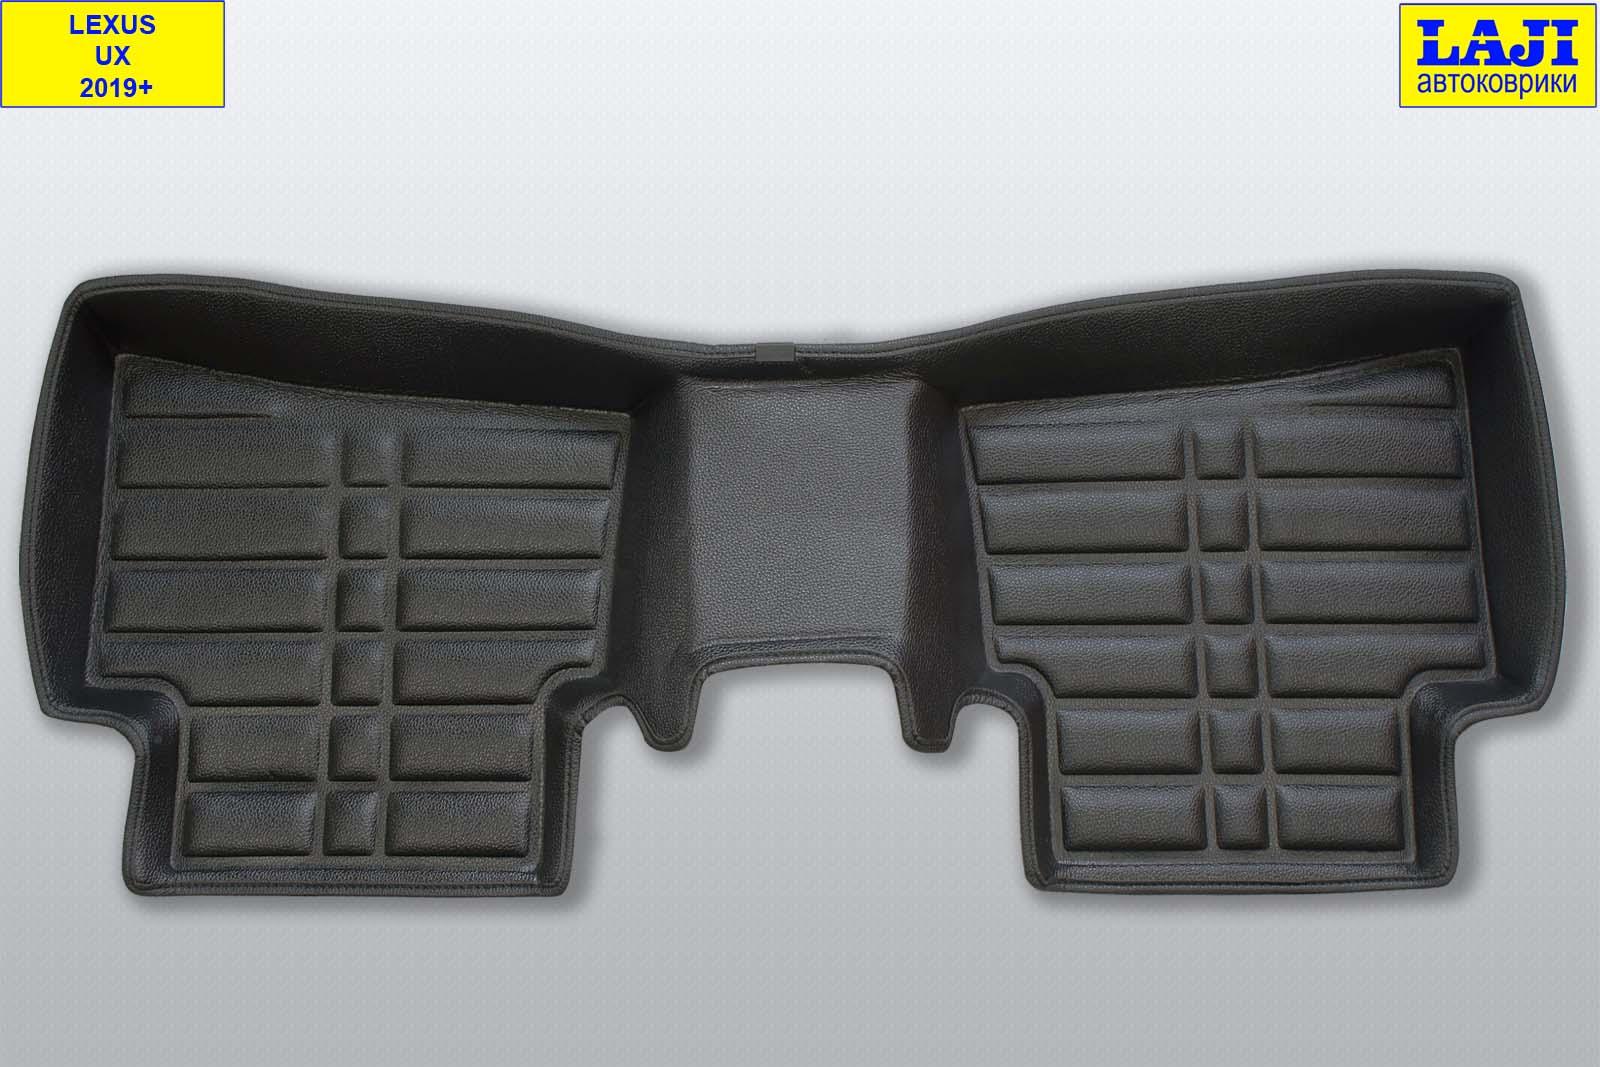 5D коврики в салон Lexus UX 2019-н.в. 9